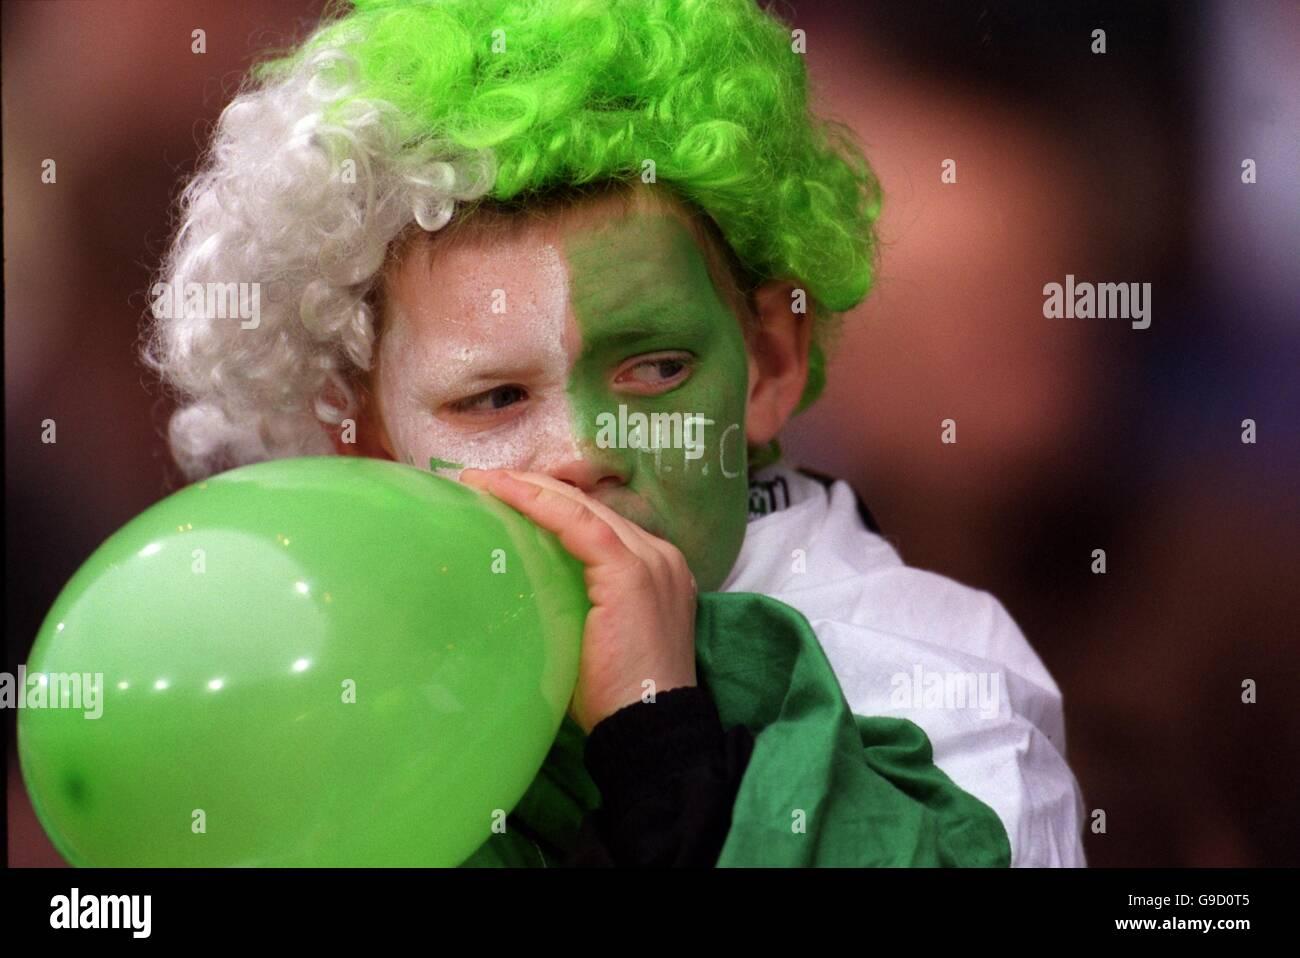 Soccer - Tennants Scottish Cup - Semi Final - Hibernian v Aberdeen - Stock Image